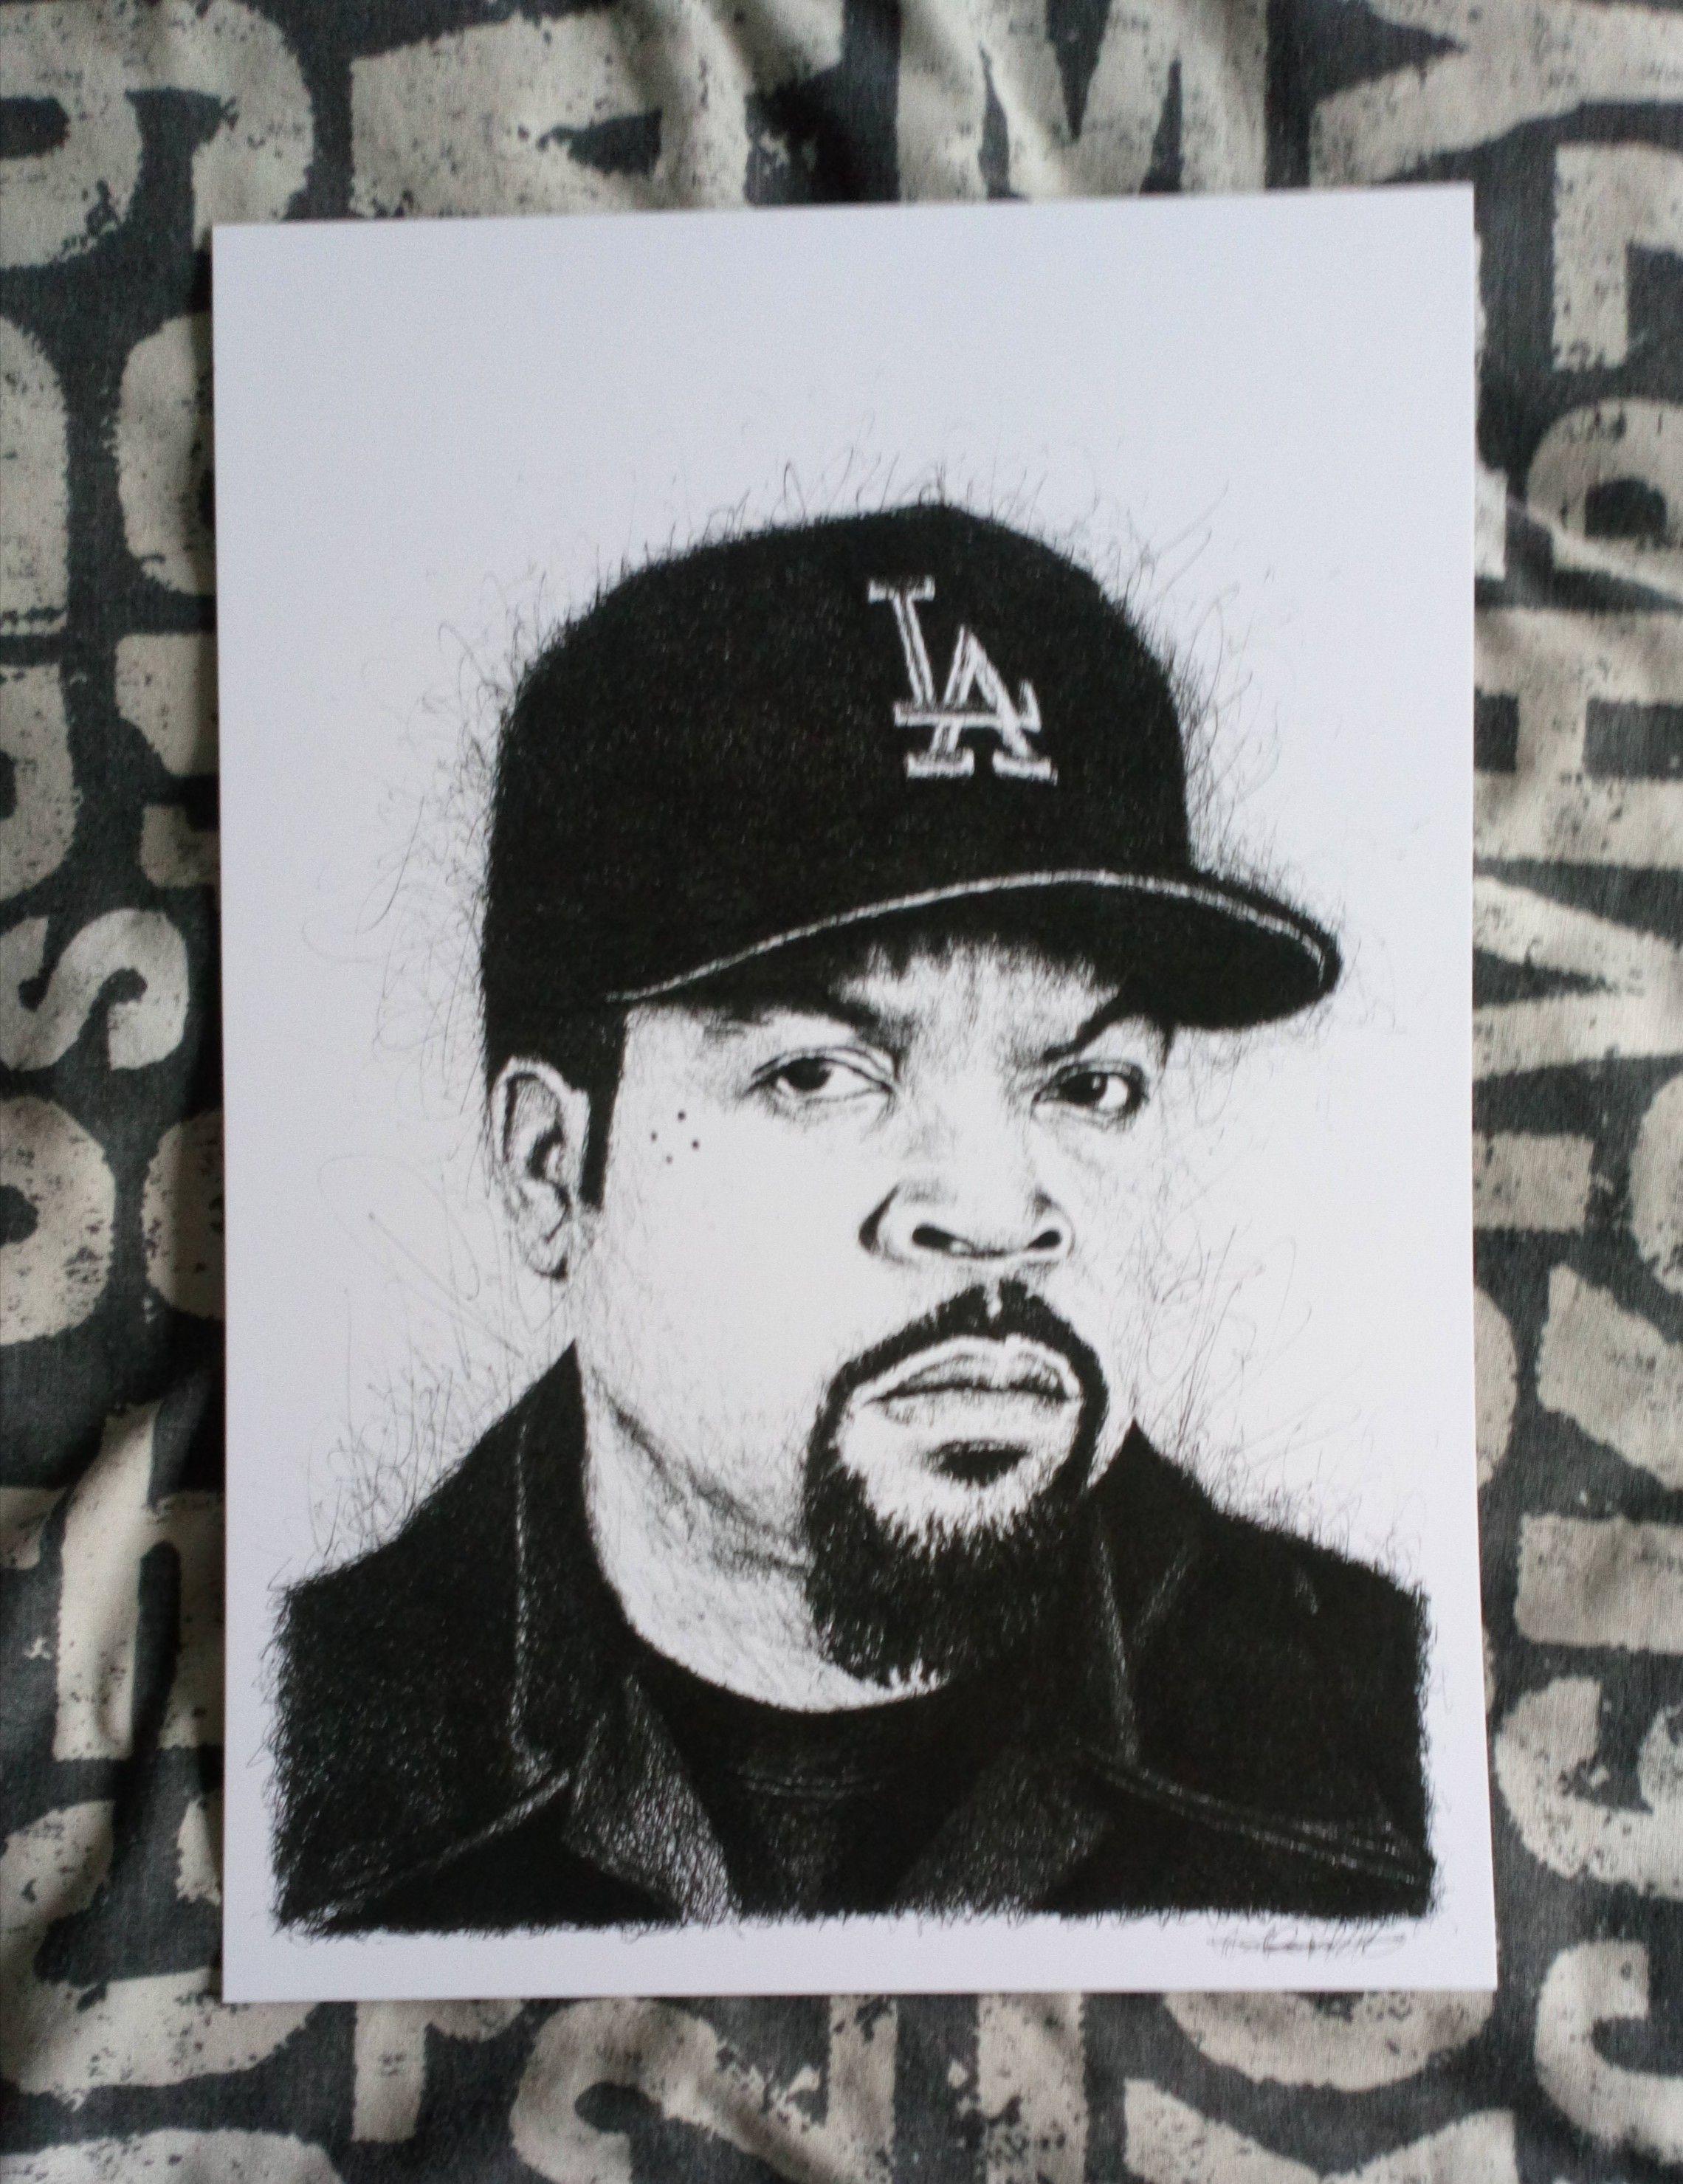 "NWA Straight Outta Compton Hip Hop Album Cover Silk Poster 20×20/"" 24×24/"" 32×32/"""